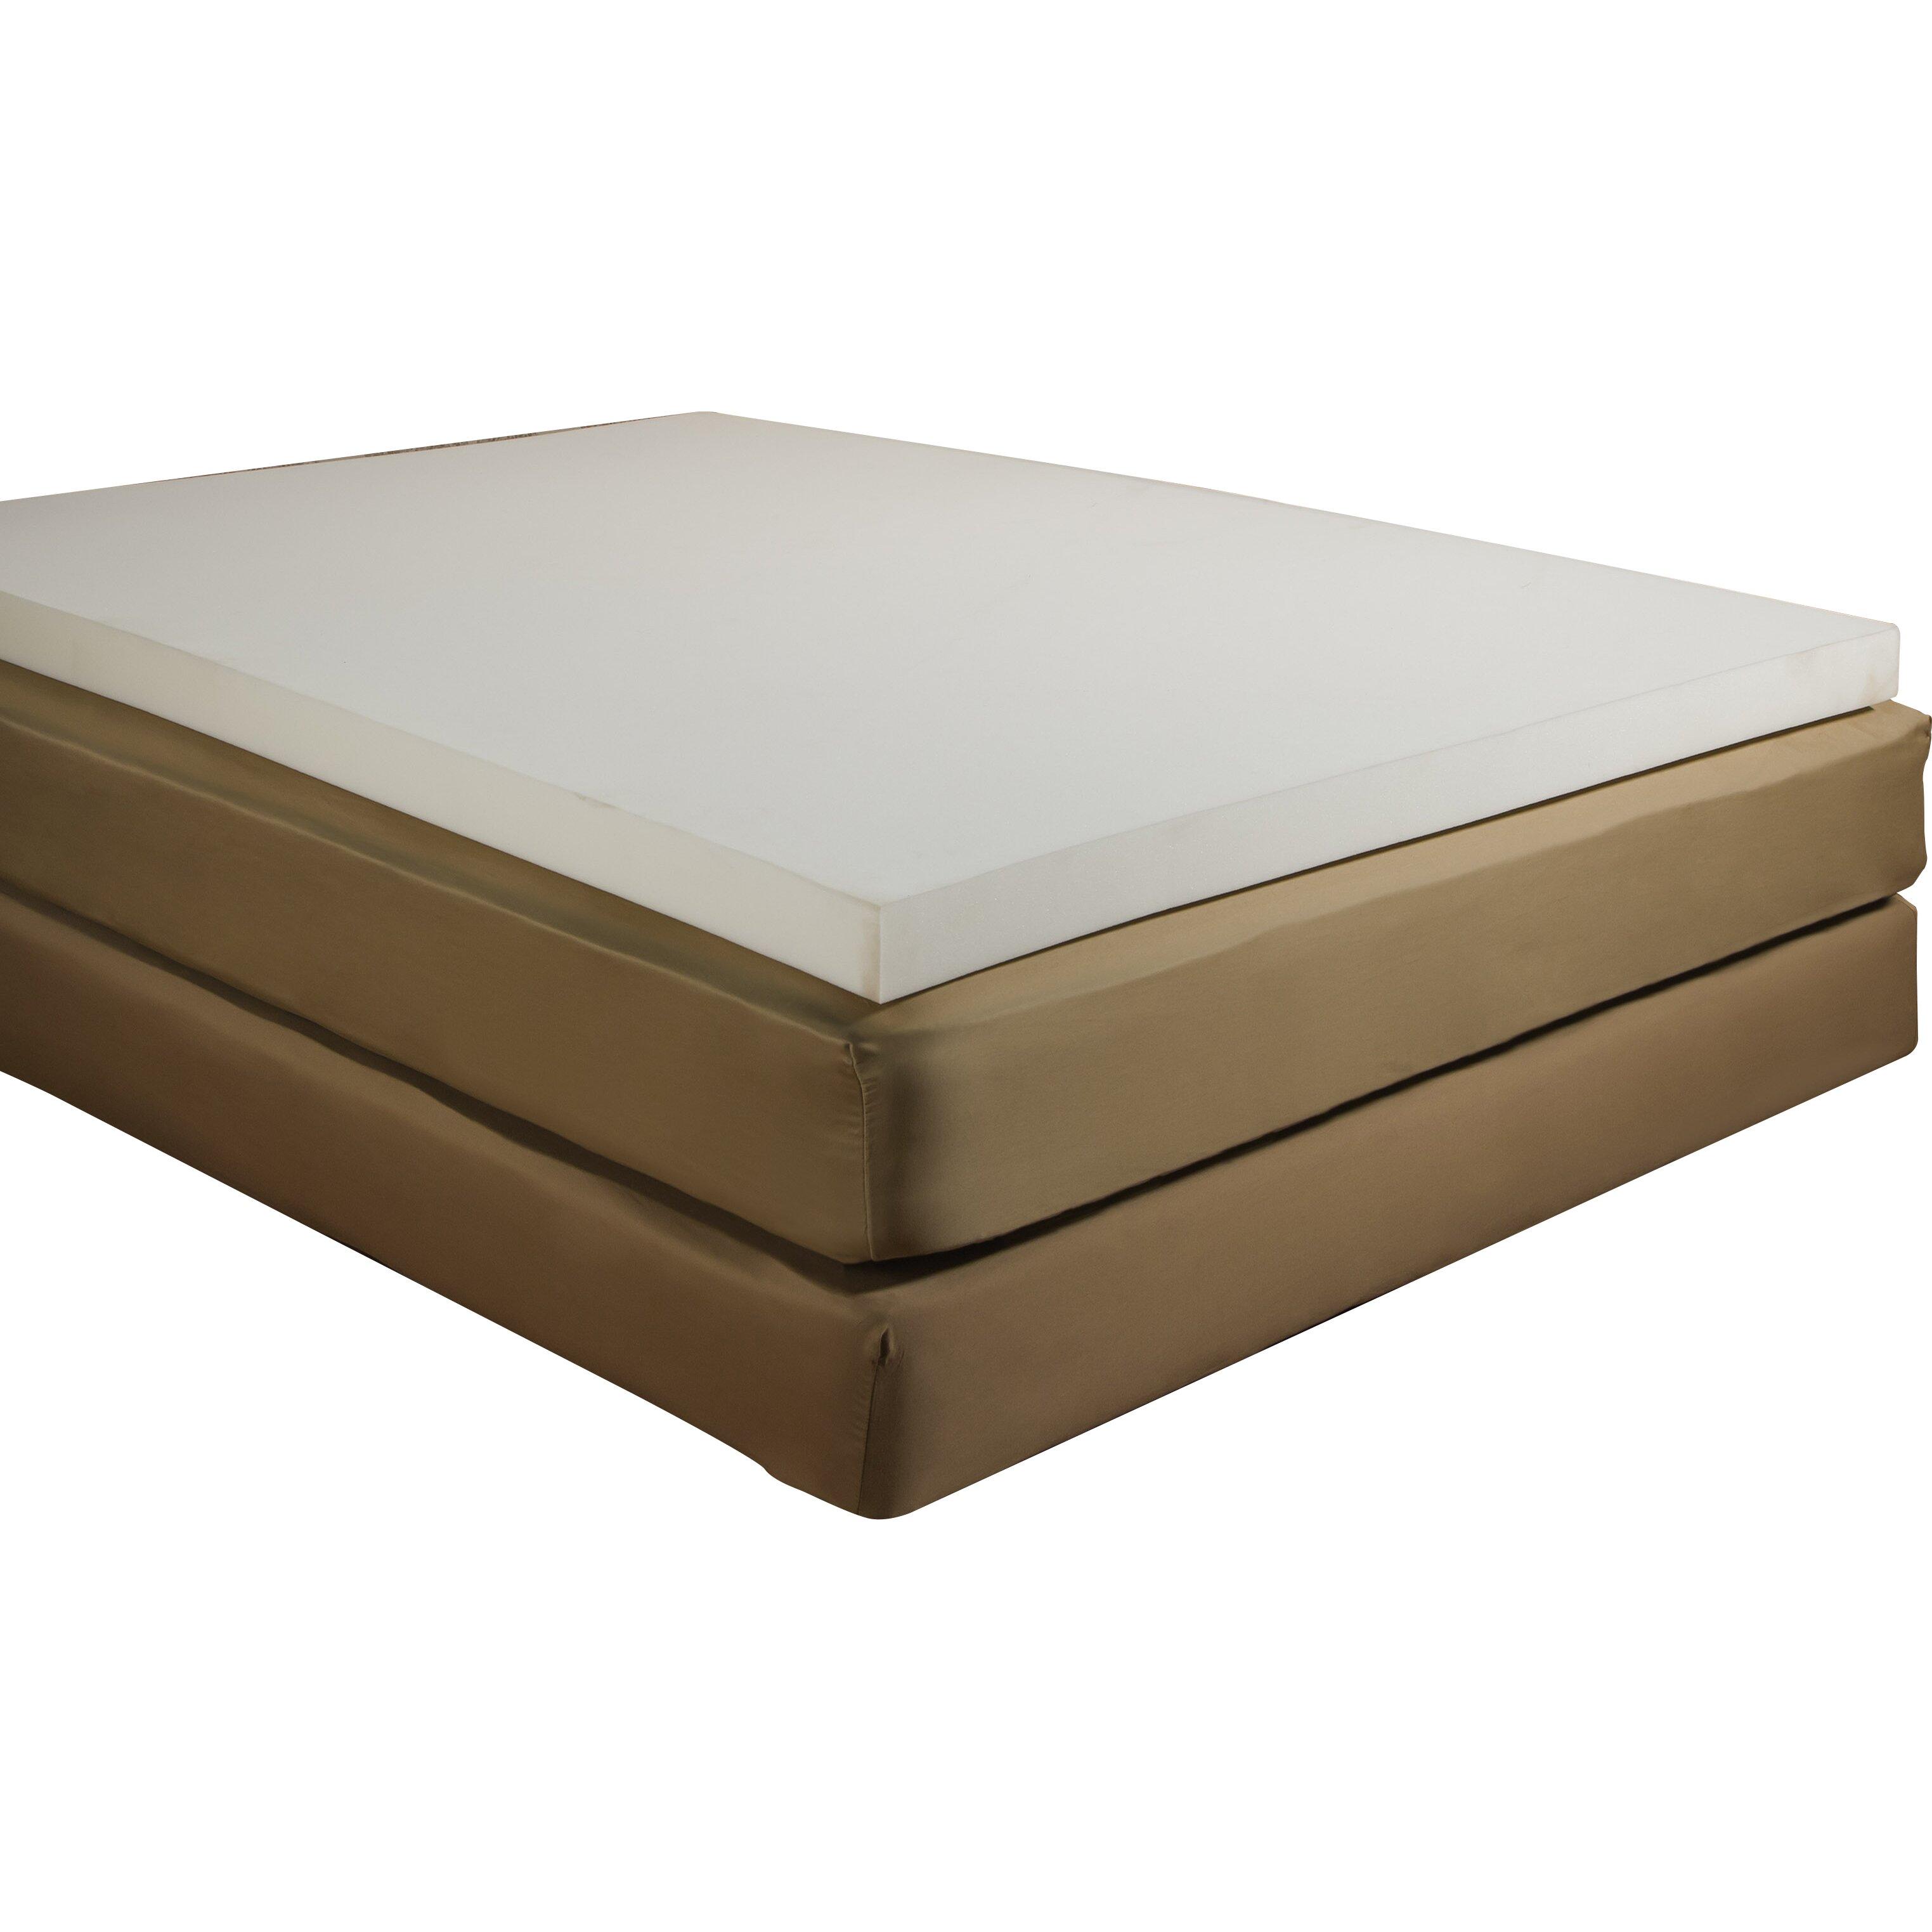 independent sleep 2 memory foam mattress topper reviews wayfair. Black Bedroom Furniture Sets. Home Design Ideas